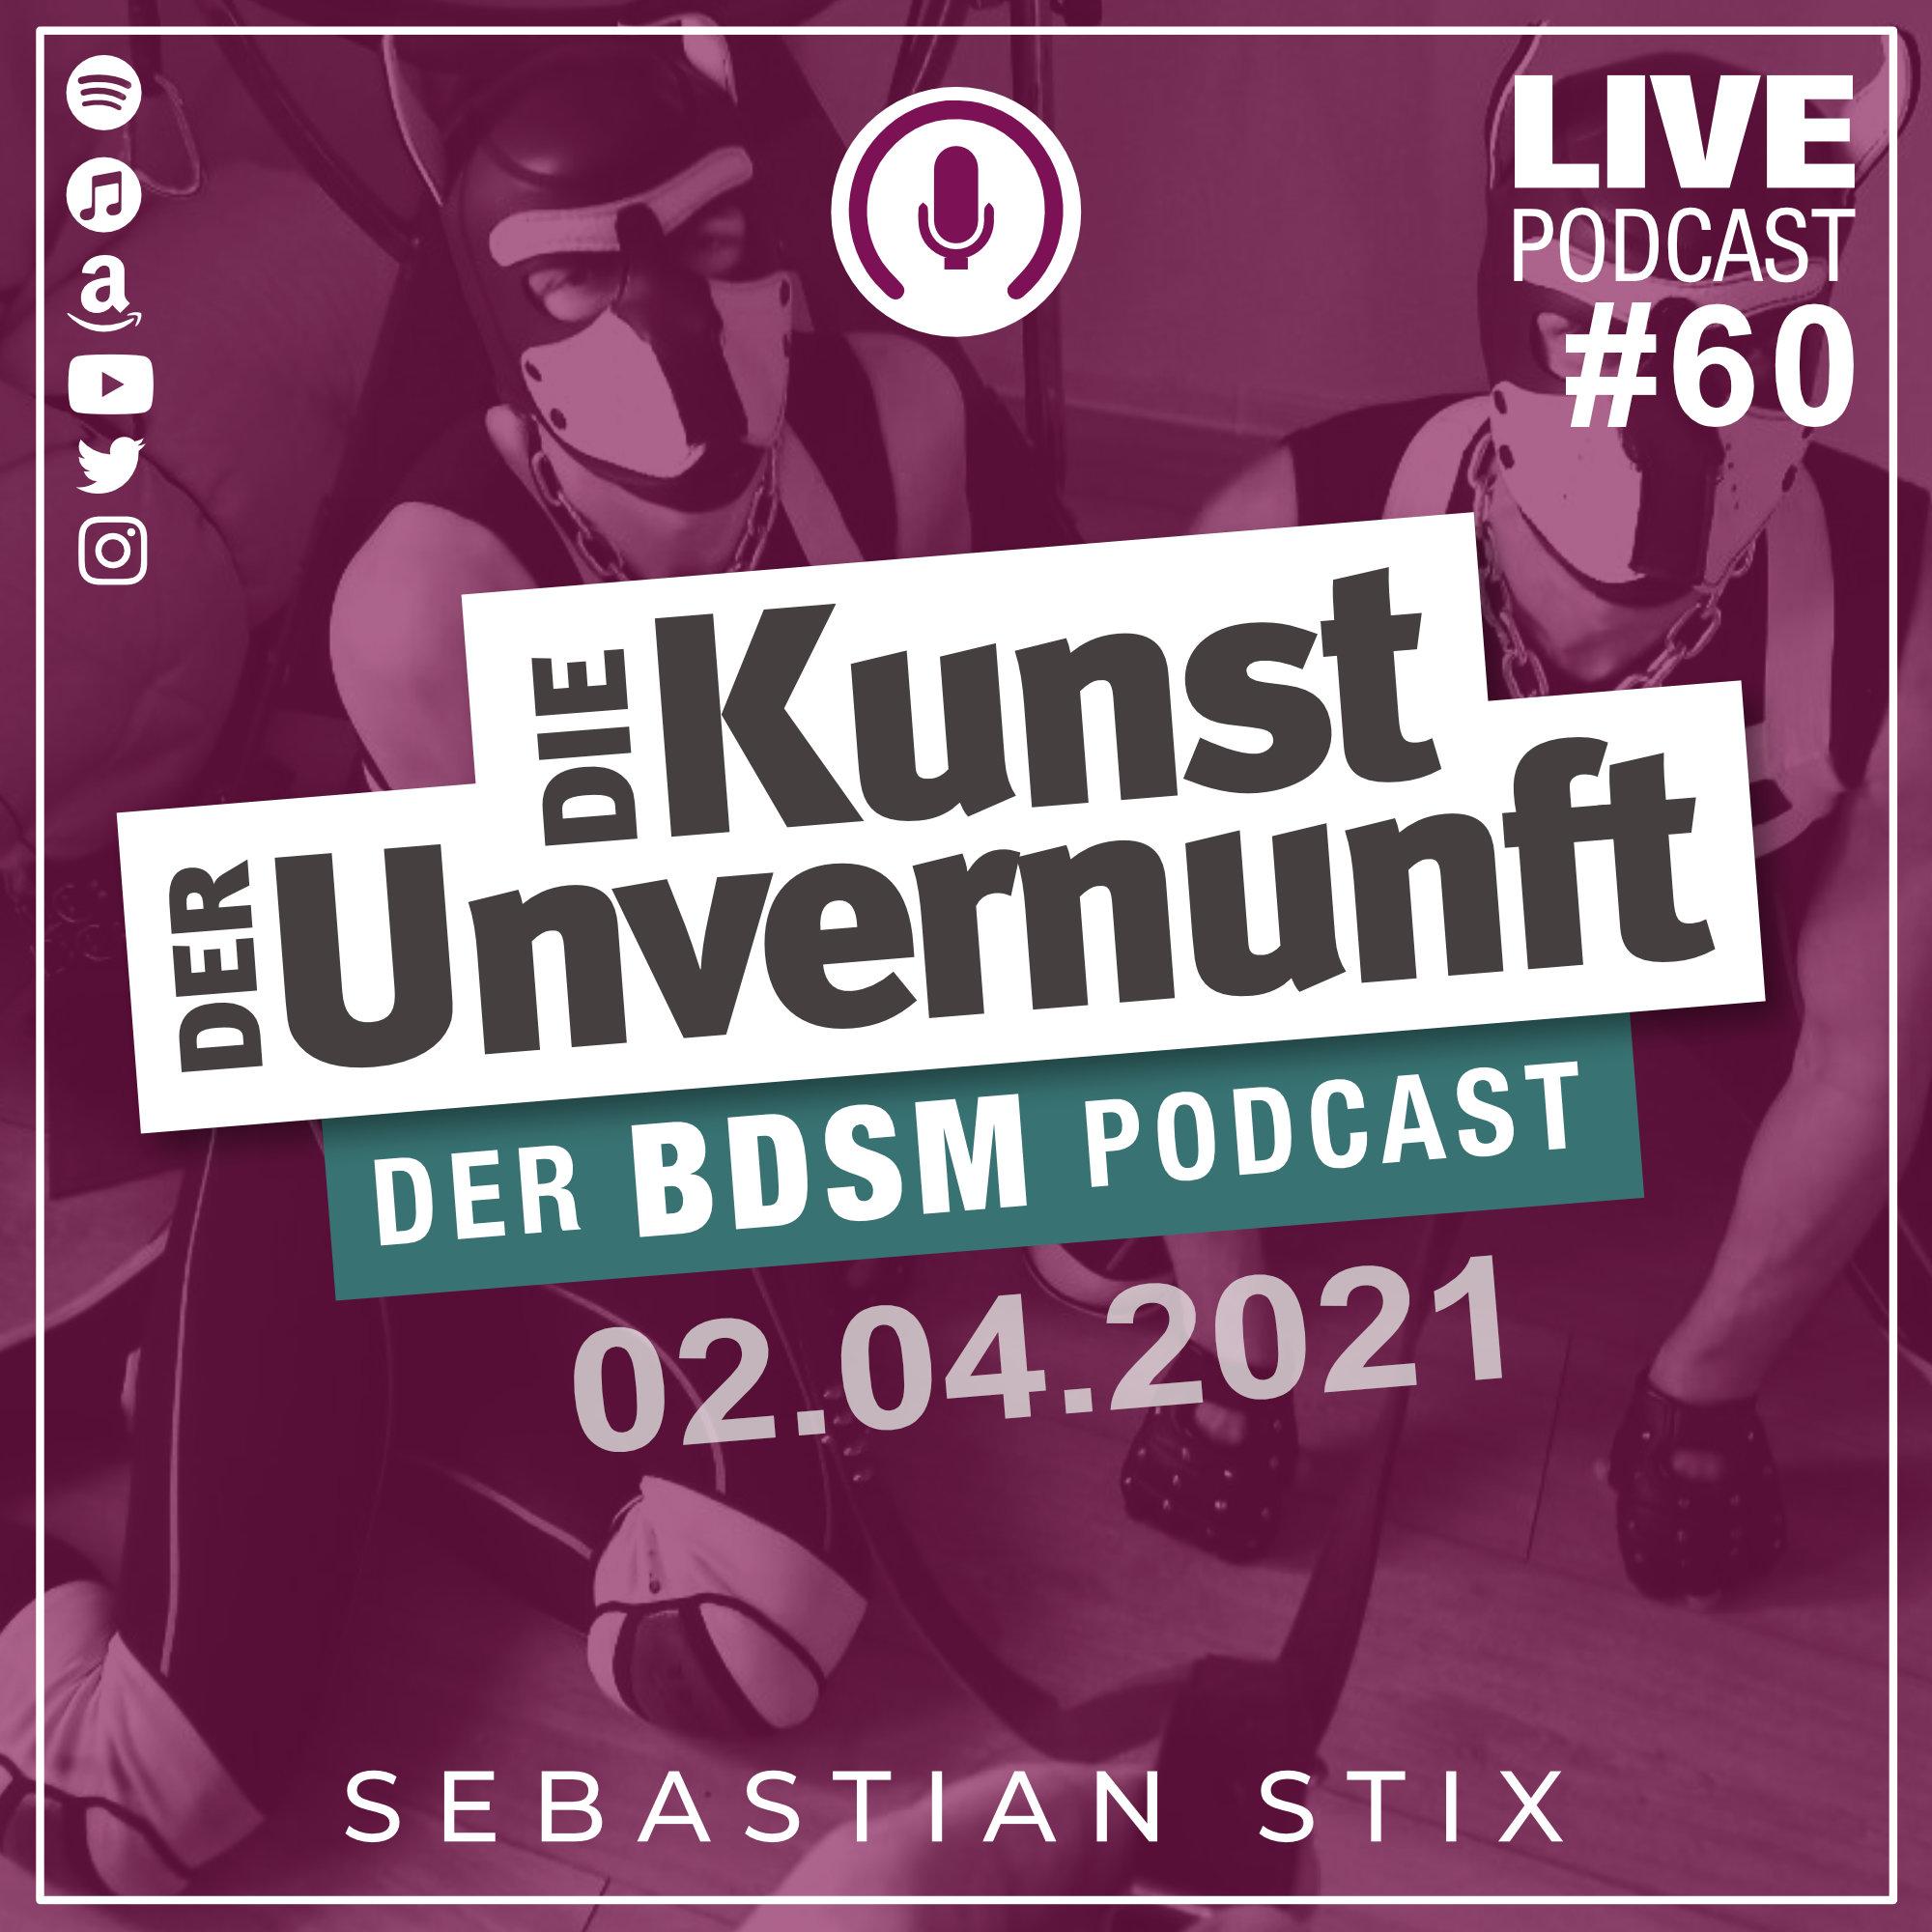 Unvernunft Live 01.04.2021 - Puppyplay mit Dan Apus Monoceros